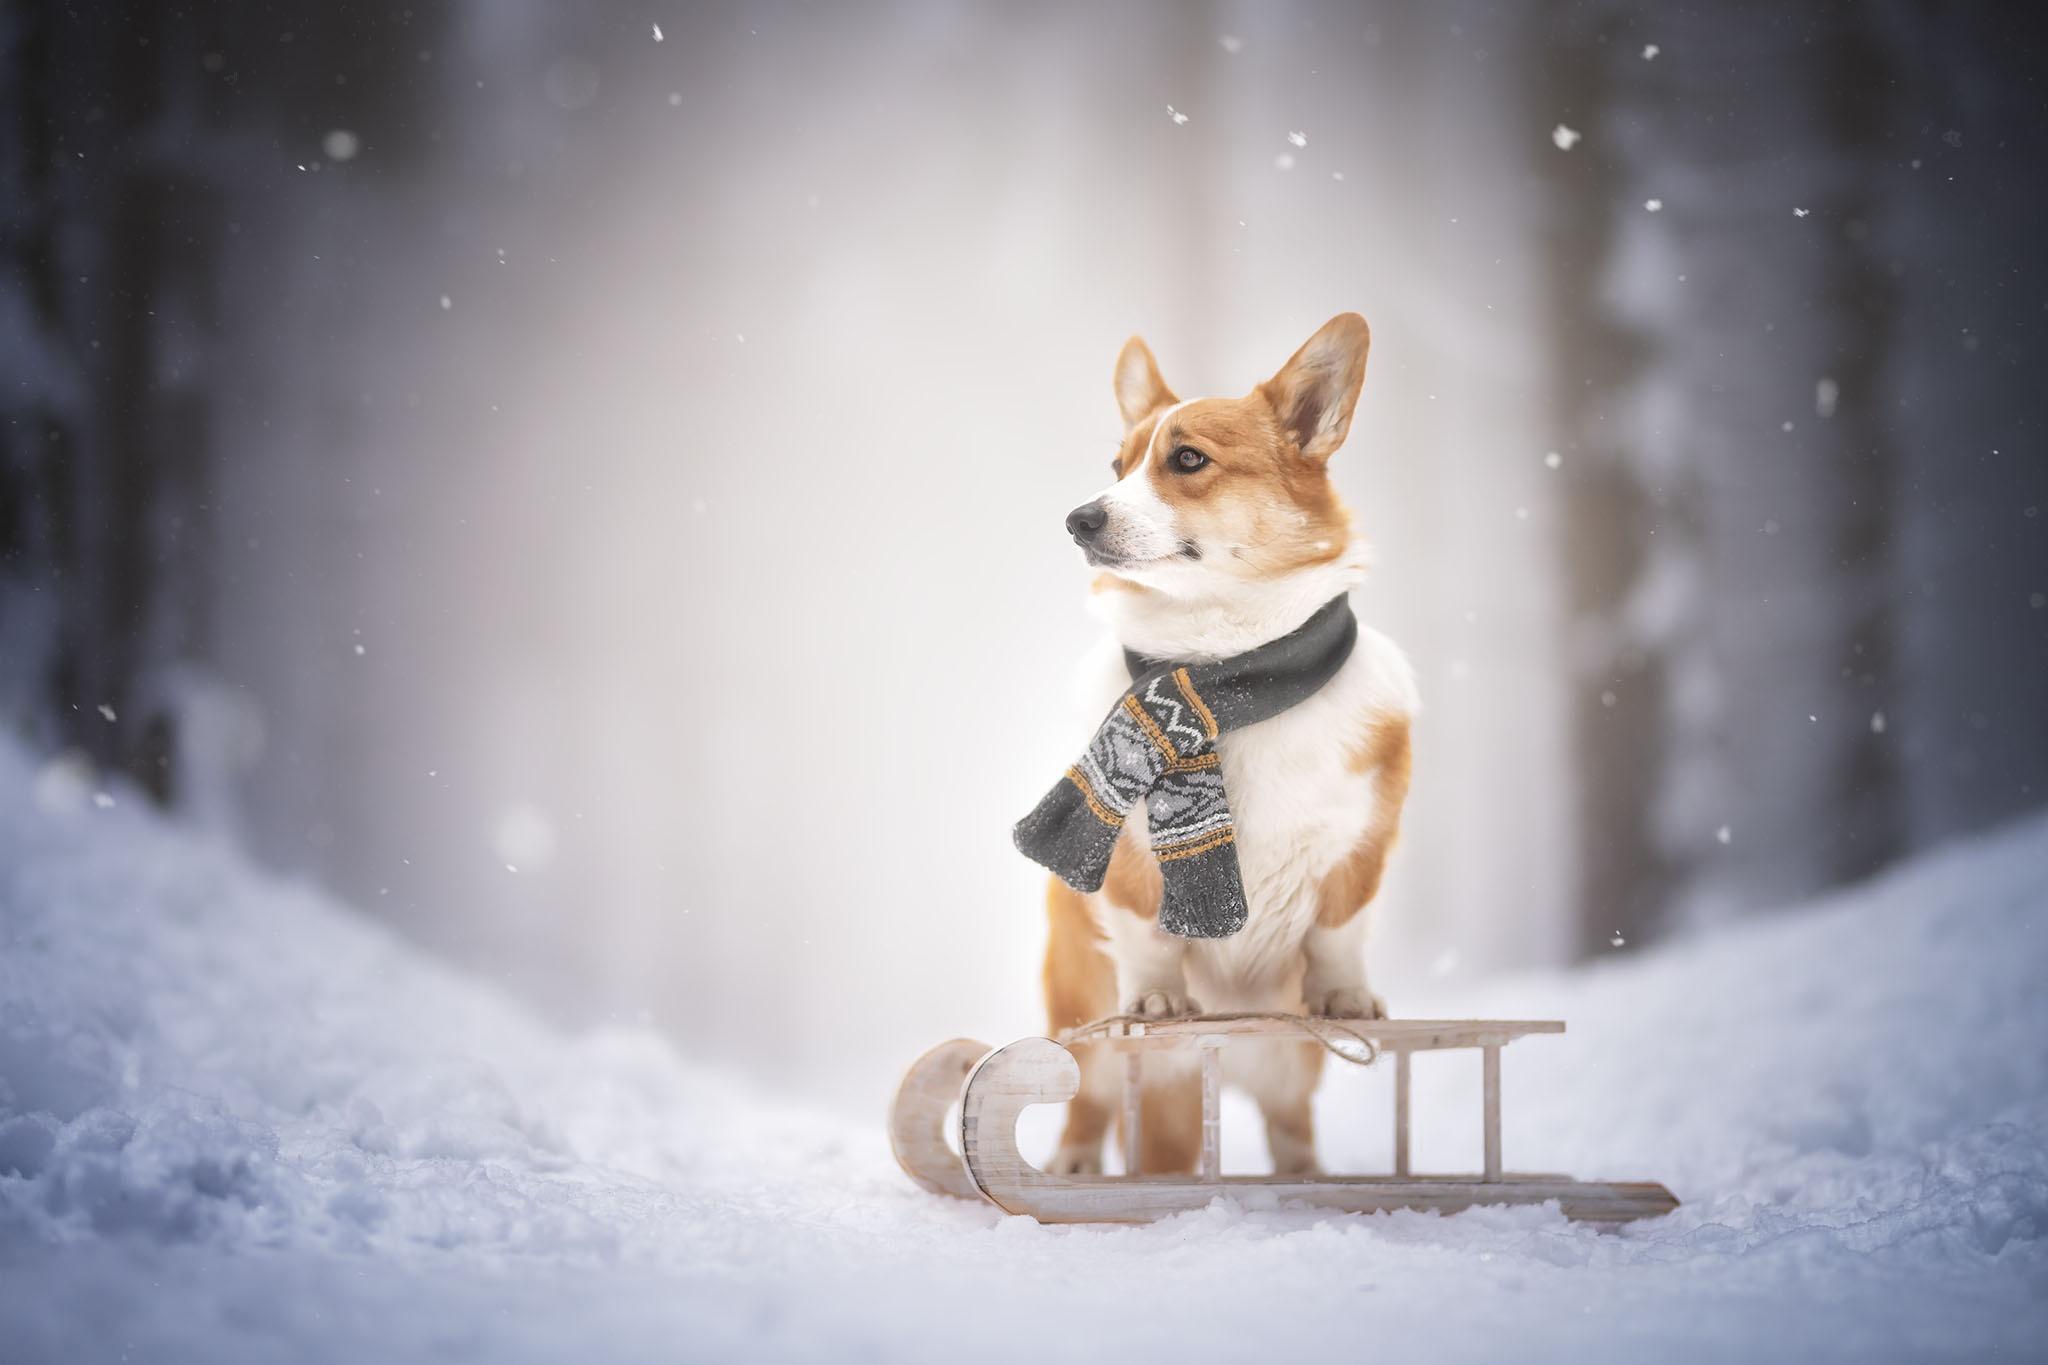 Dog Pet Snow Winter 2048x1365